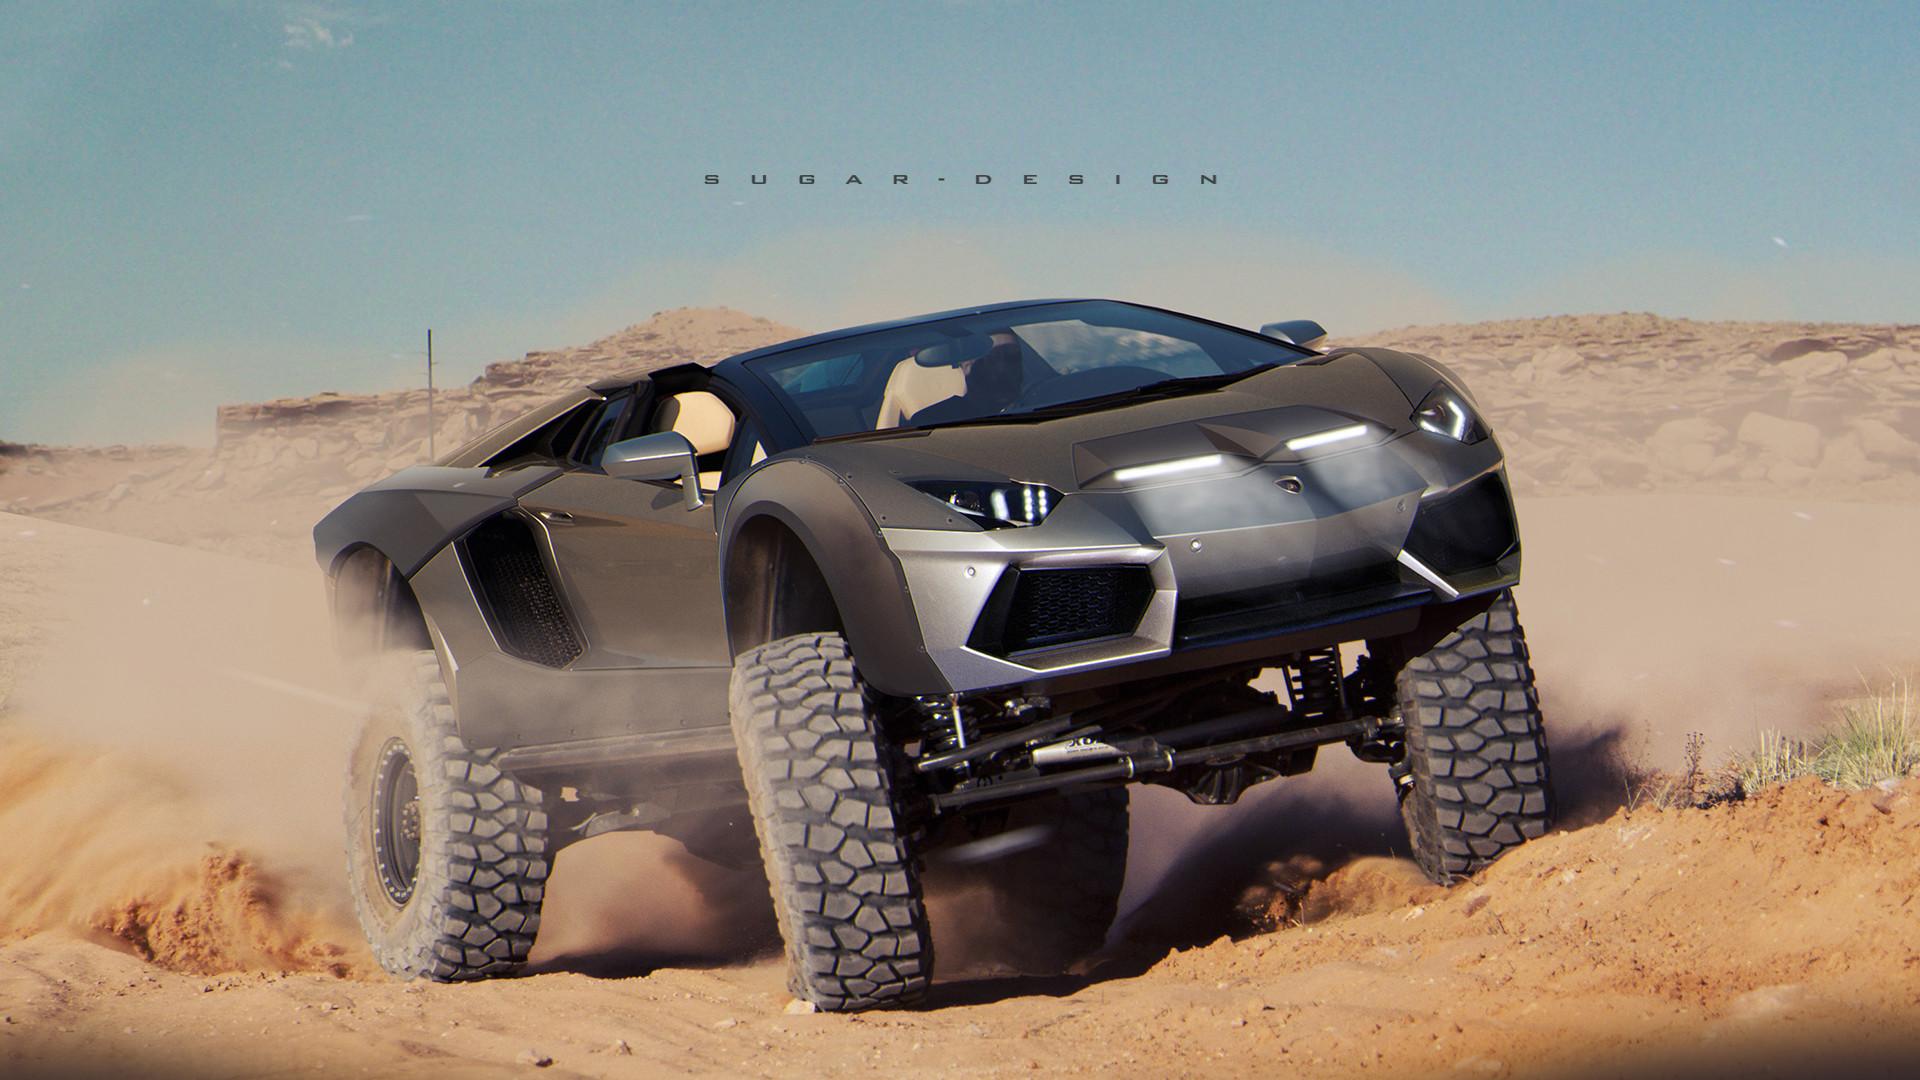 Sugar Chow Lamborghini Lm700